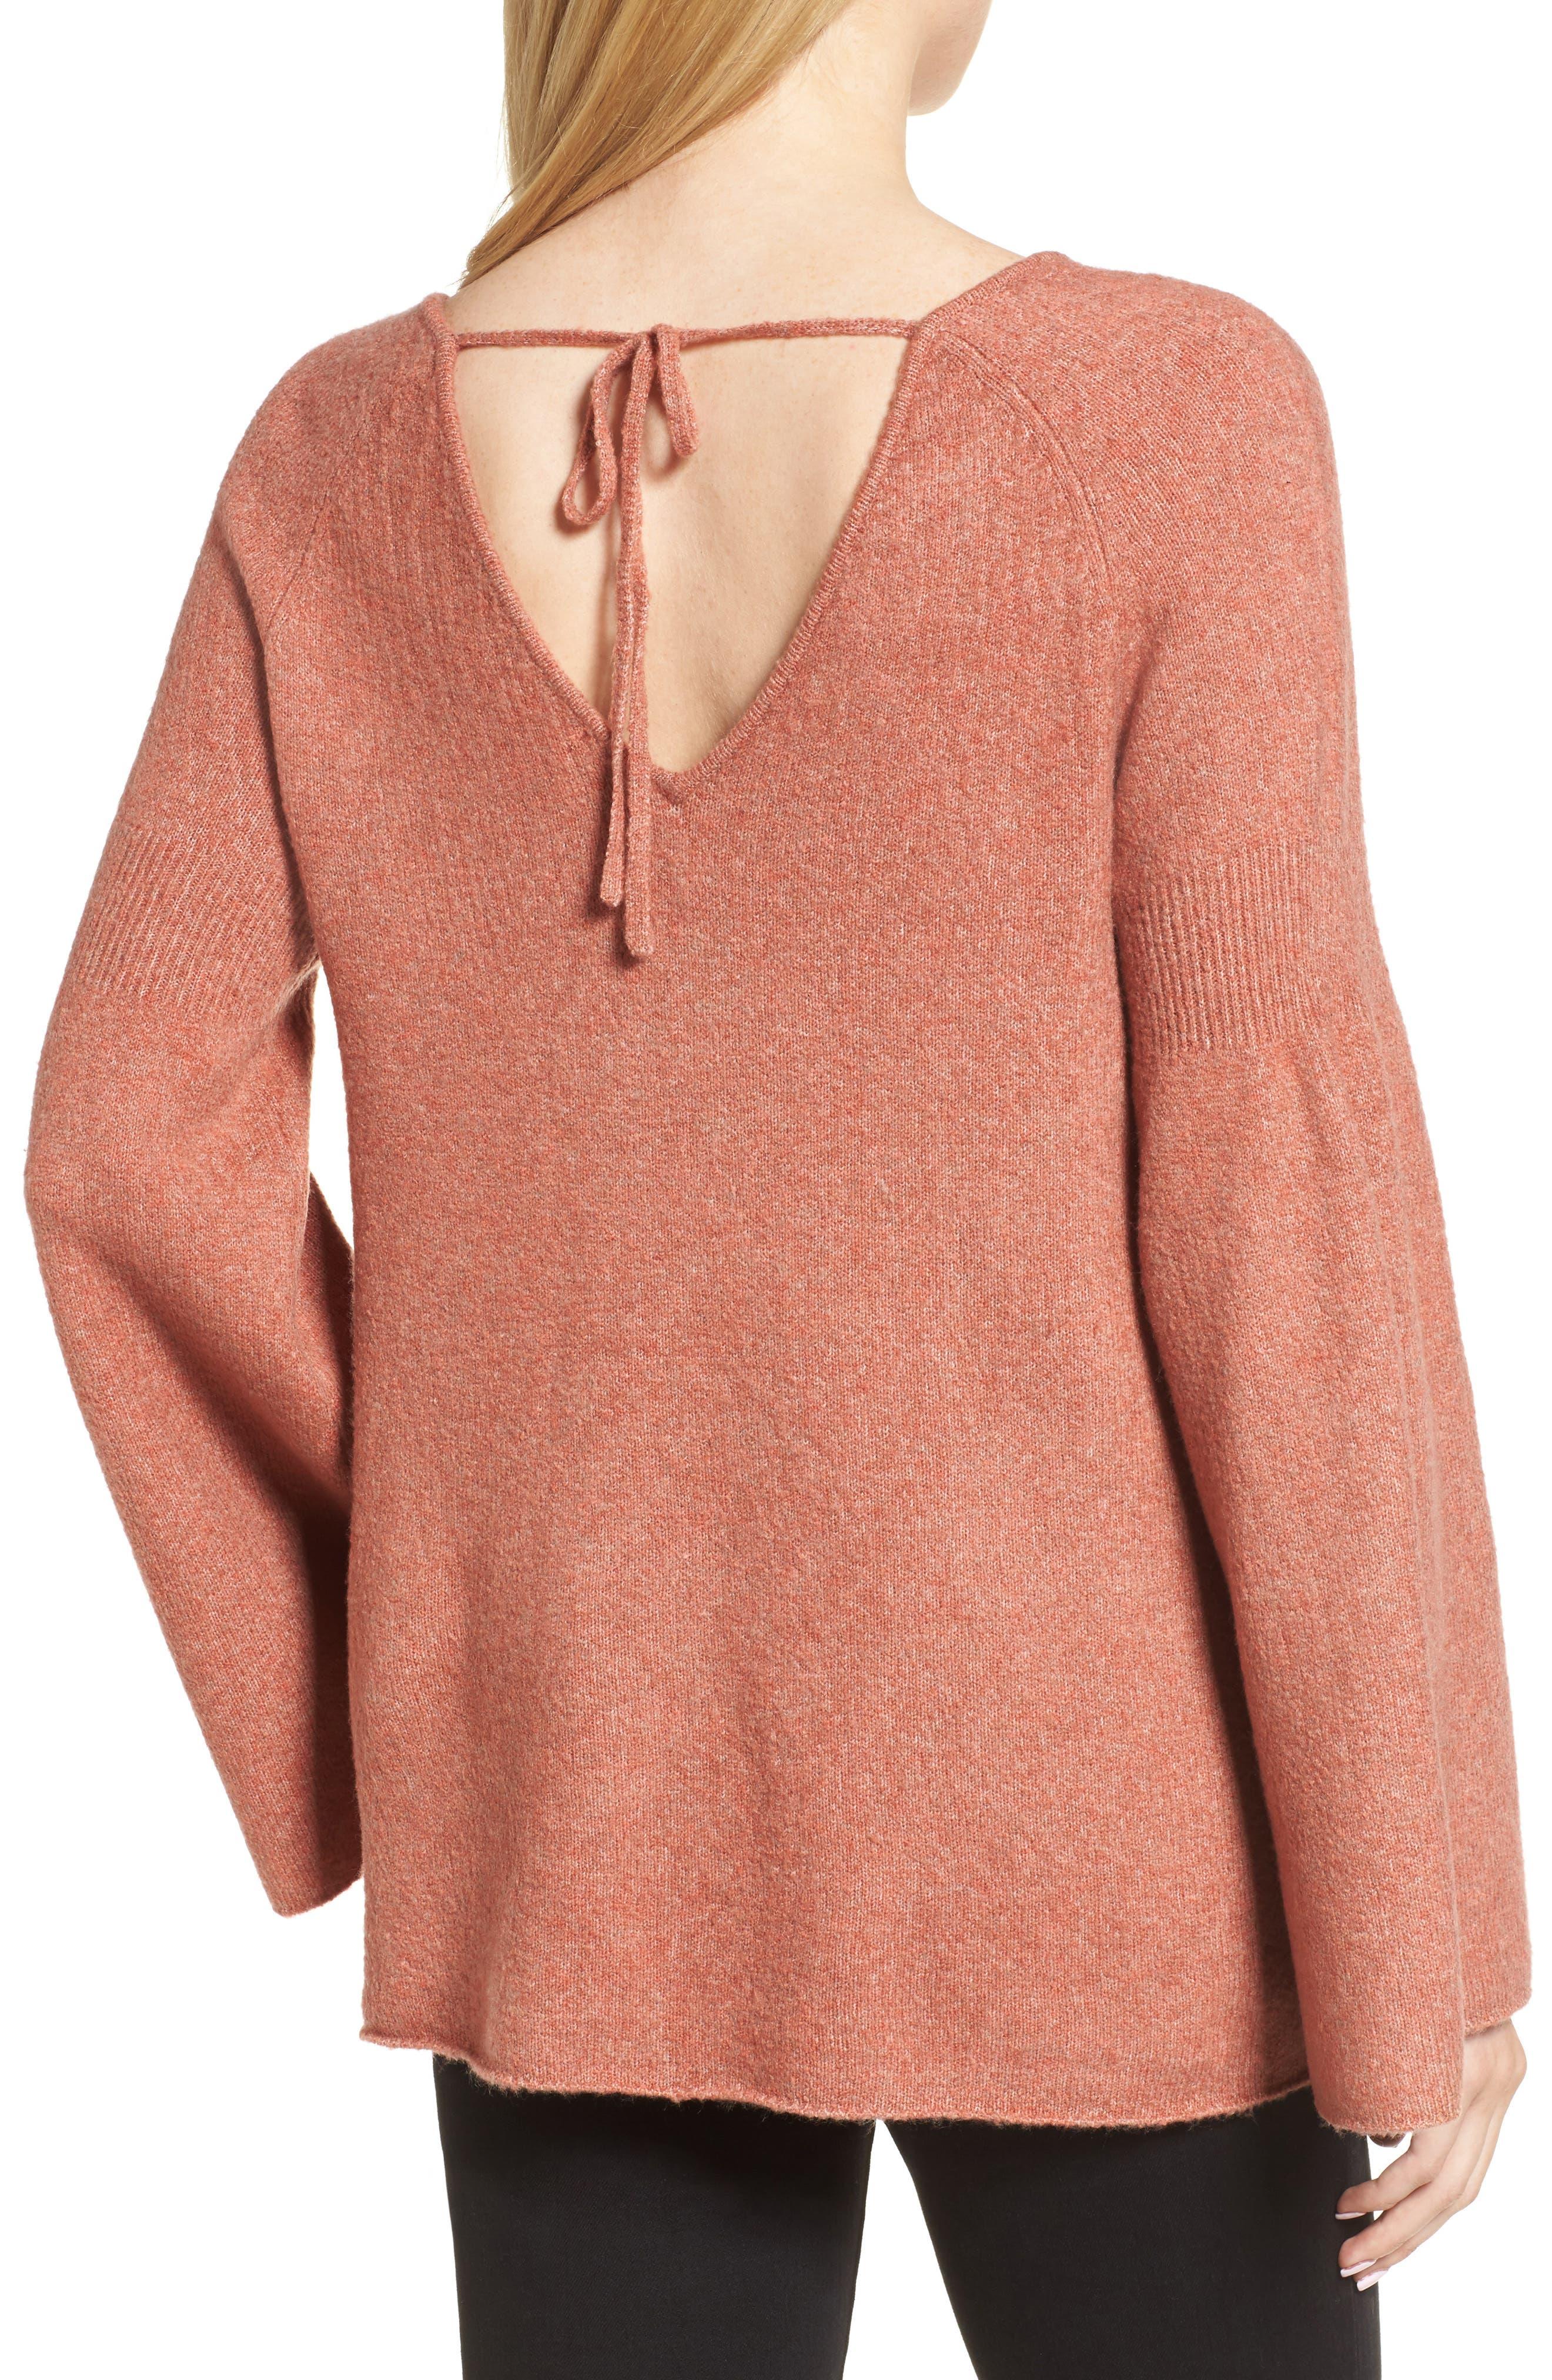 Bell Sleeve Sweater,                             Alternate thumbnail 2, color,                             Coral Rose Tea Rainbow Multi